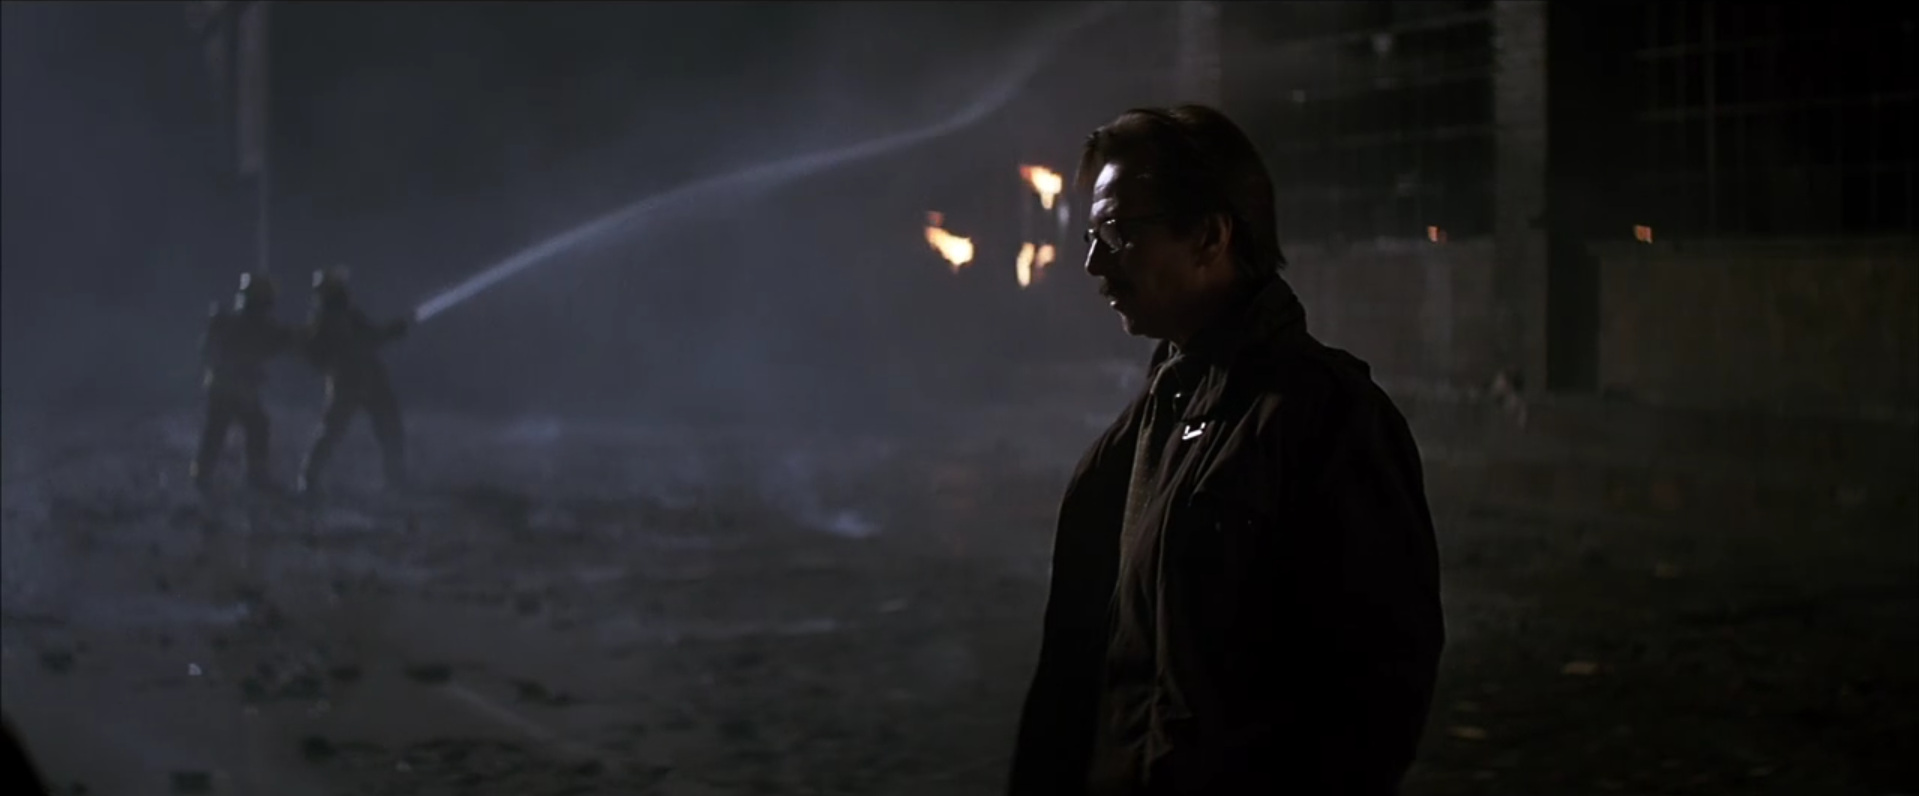 The Dark Knight  (2008): evoking 9/11